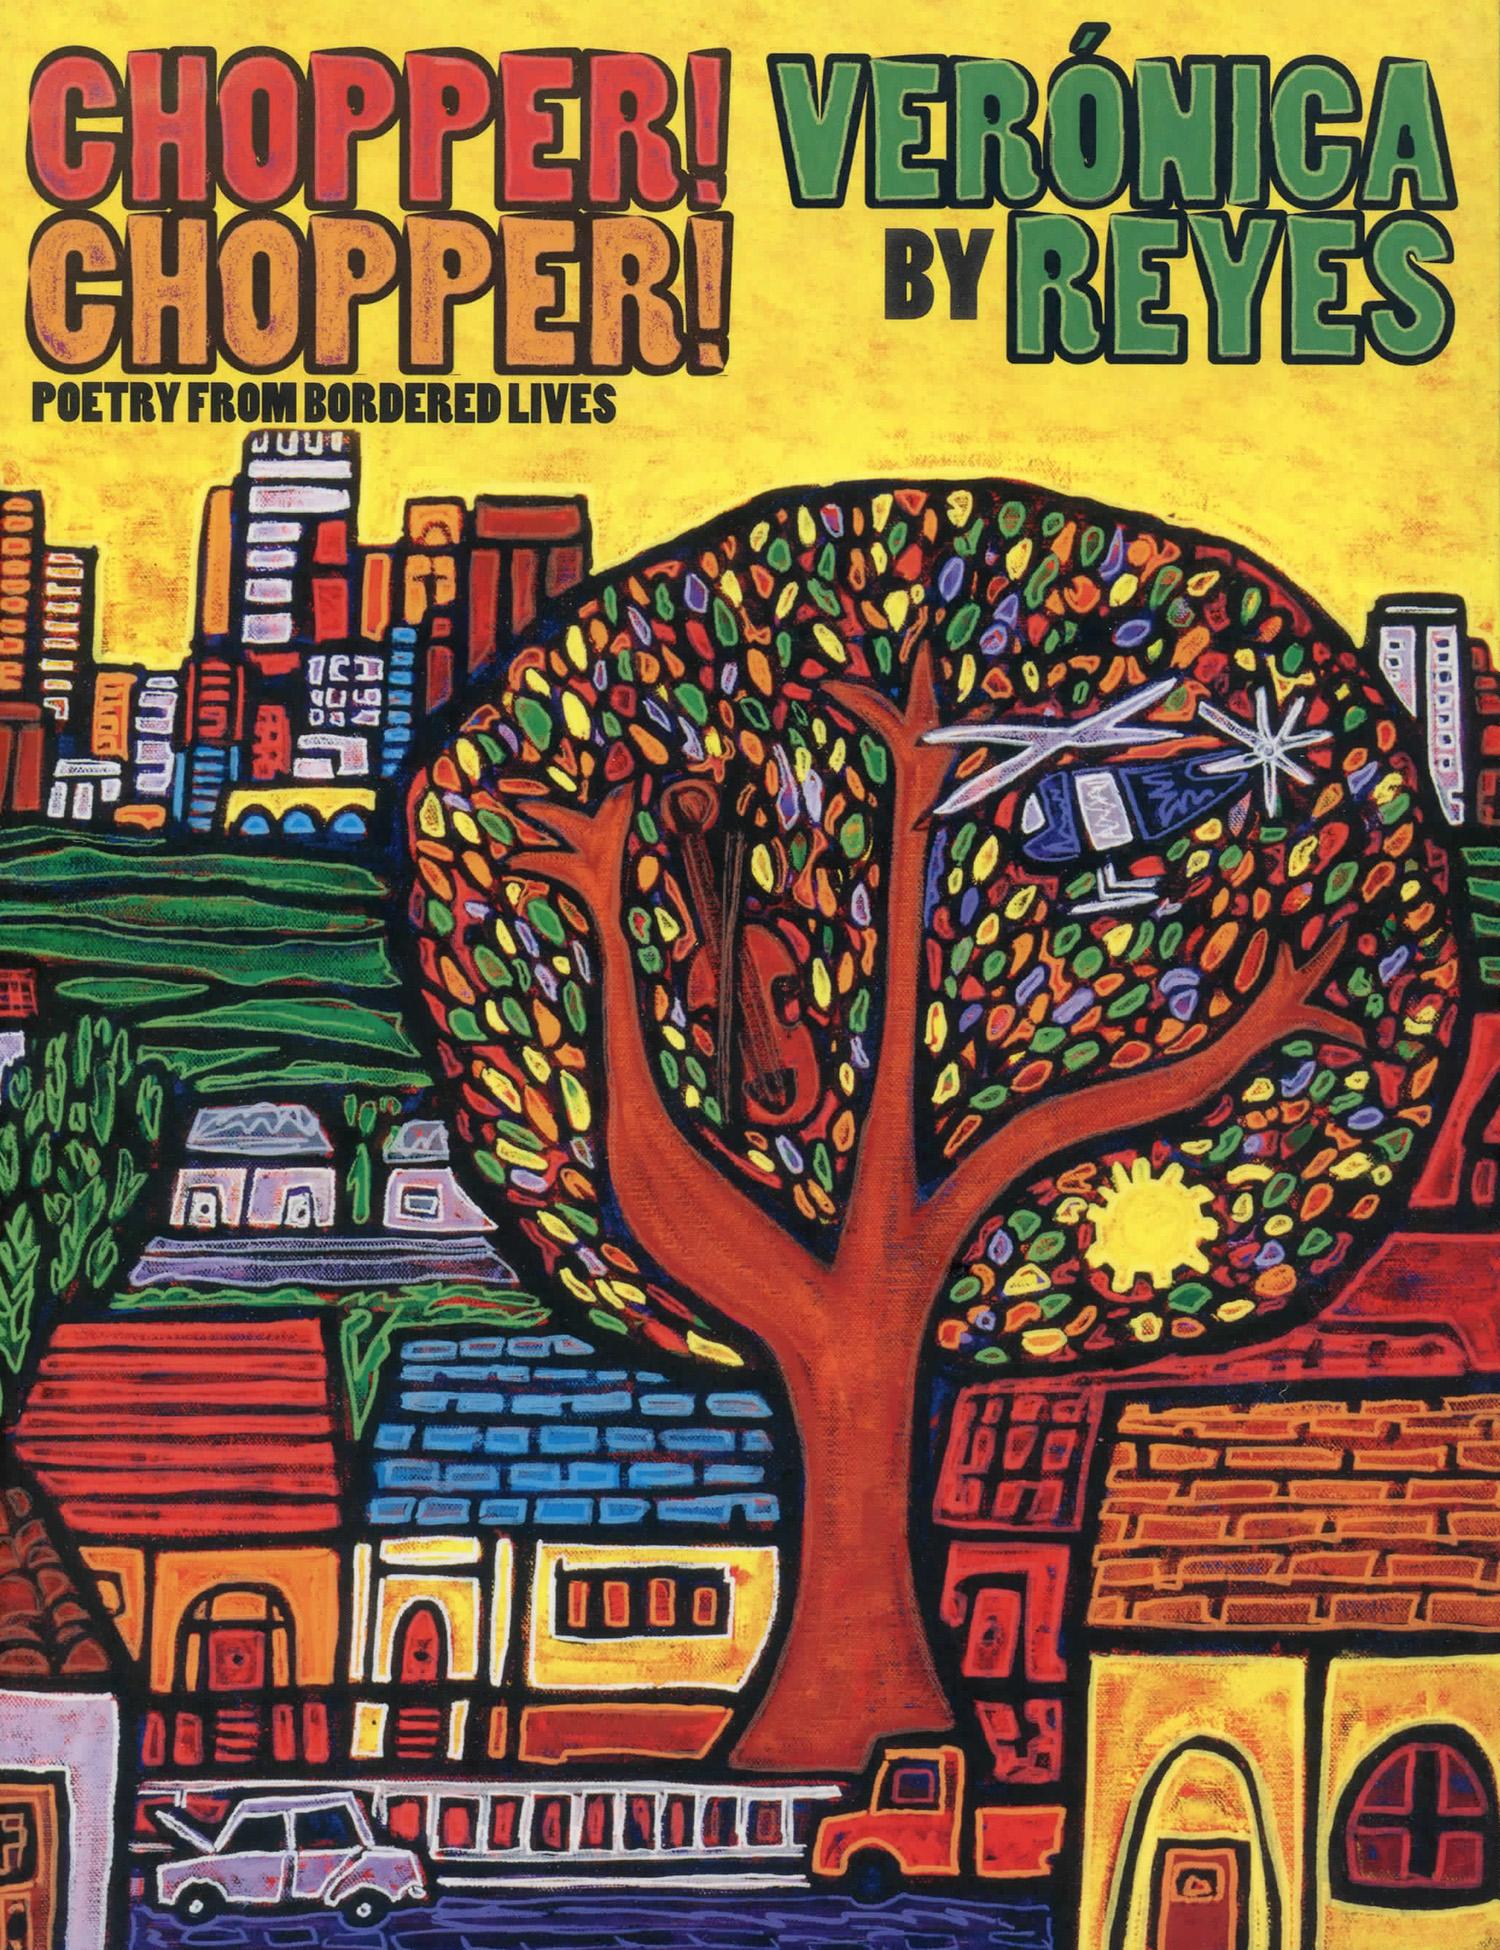 chopper! chopper!, 2013.jpg